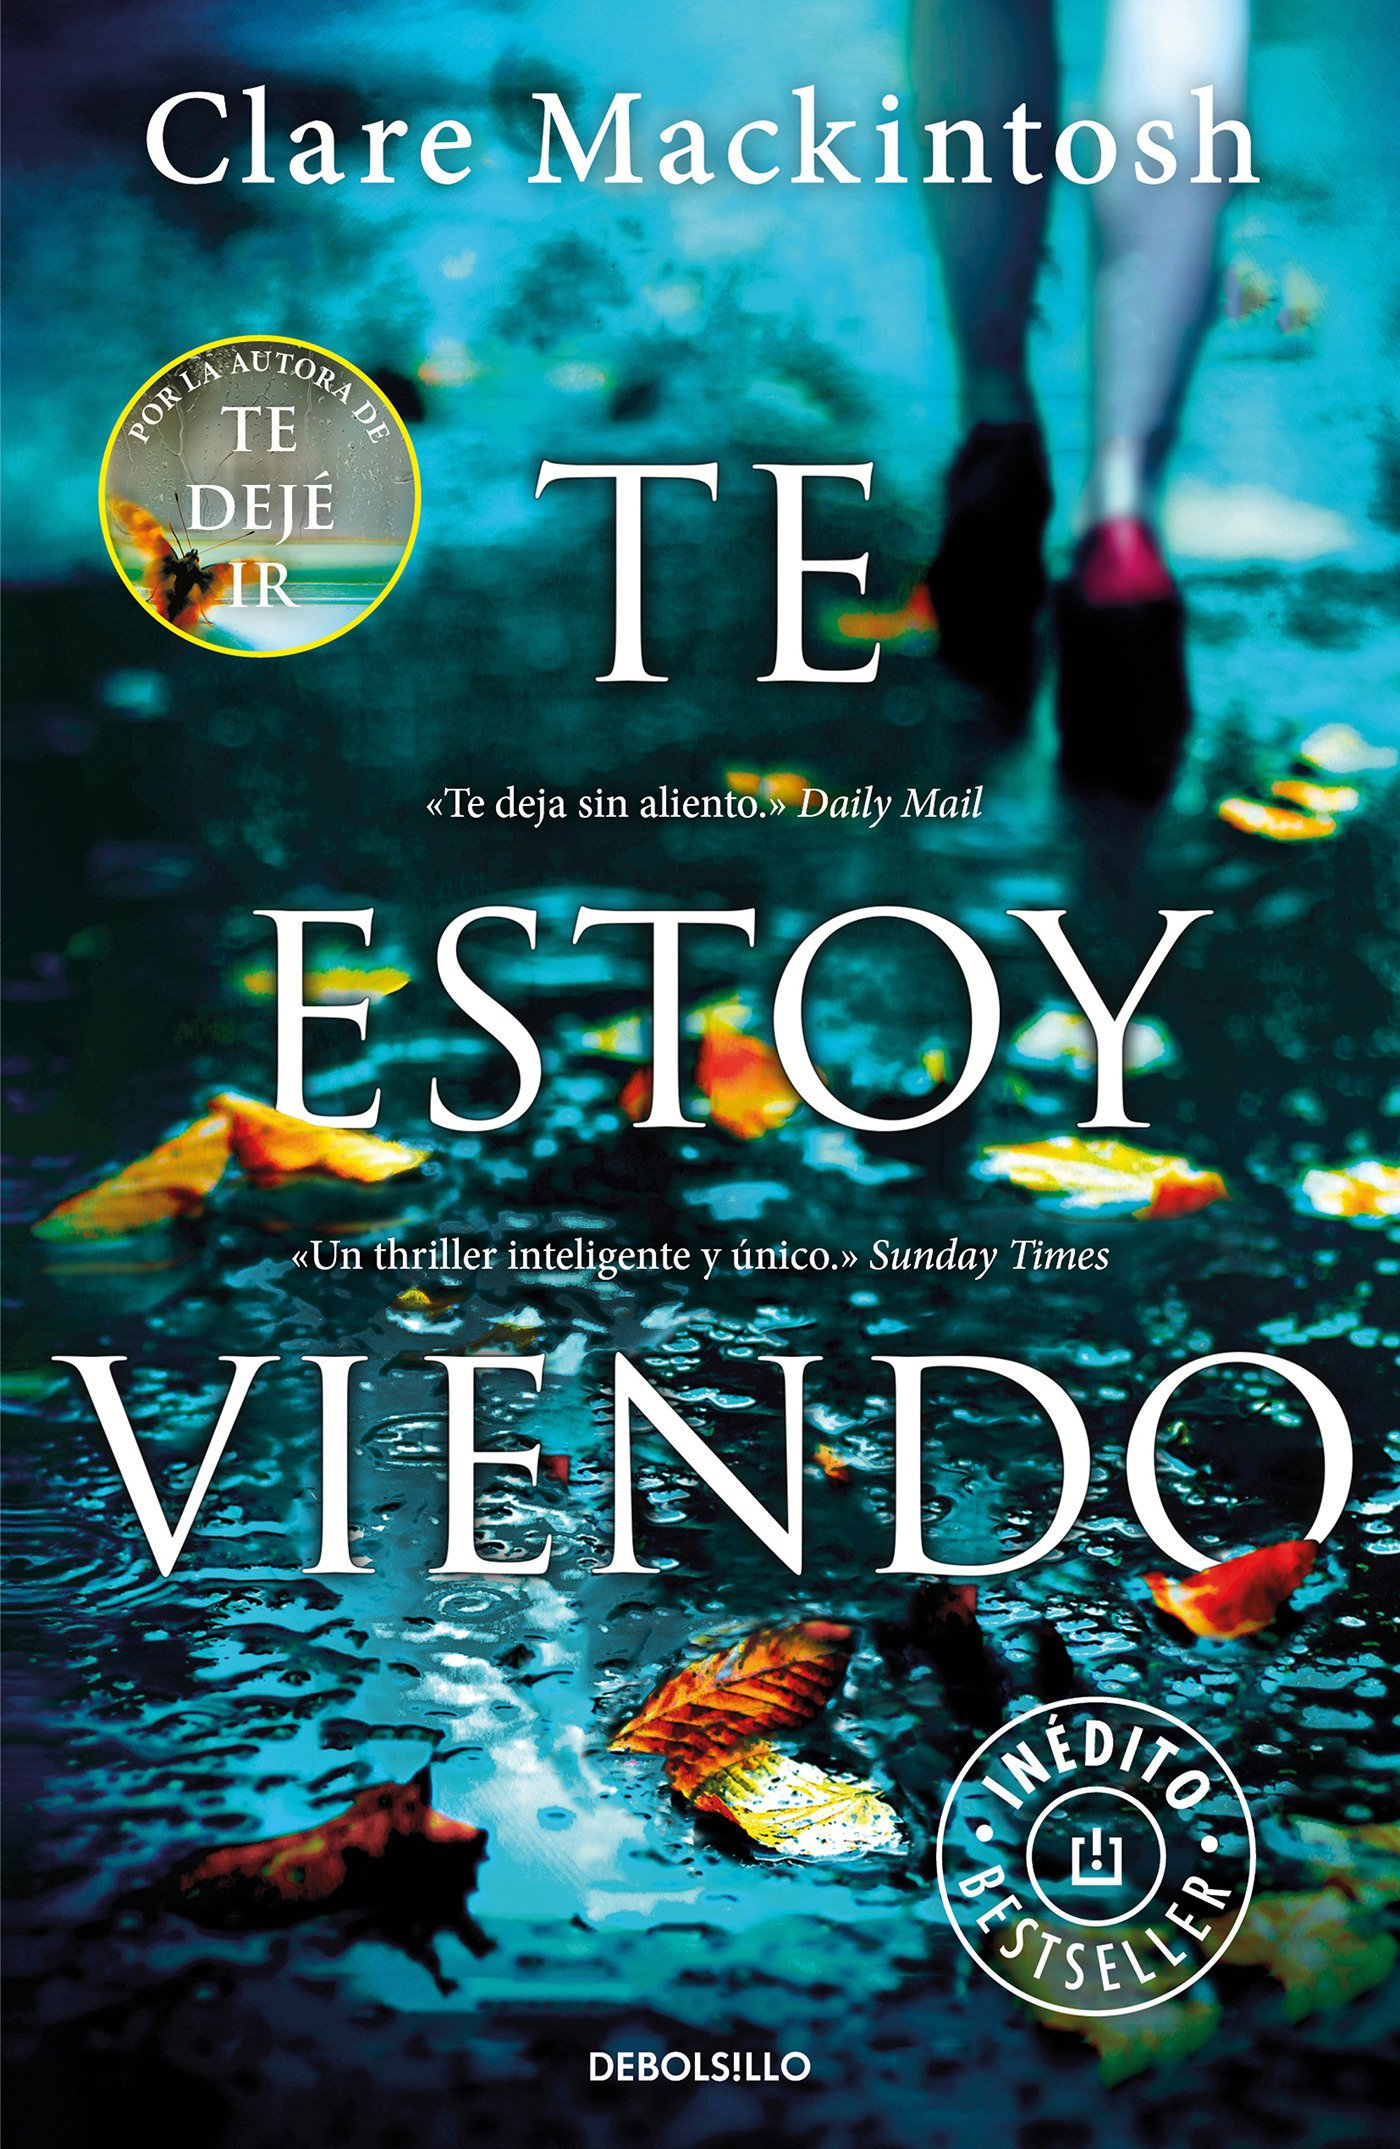 Te Estoy Viendo / I See You: Amazon.co.uk: Clare Mackintosh: 9788466340250:  Books